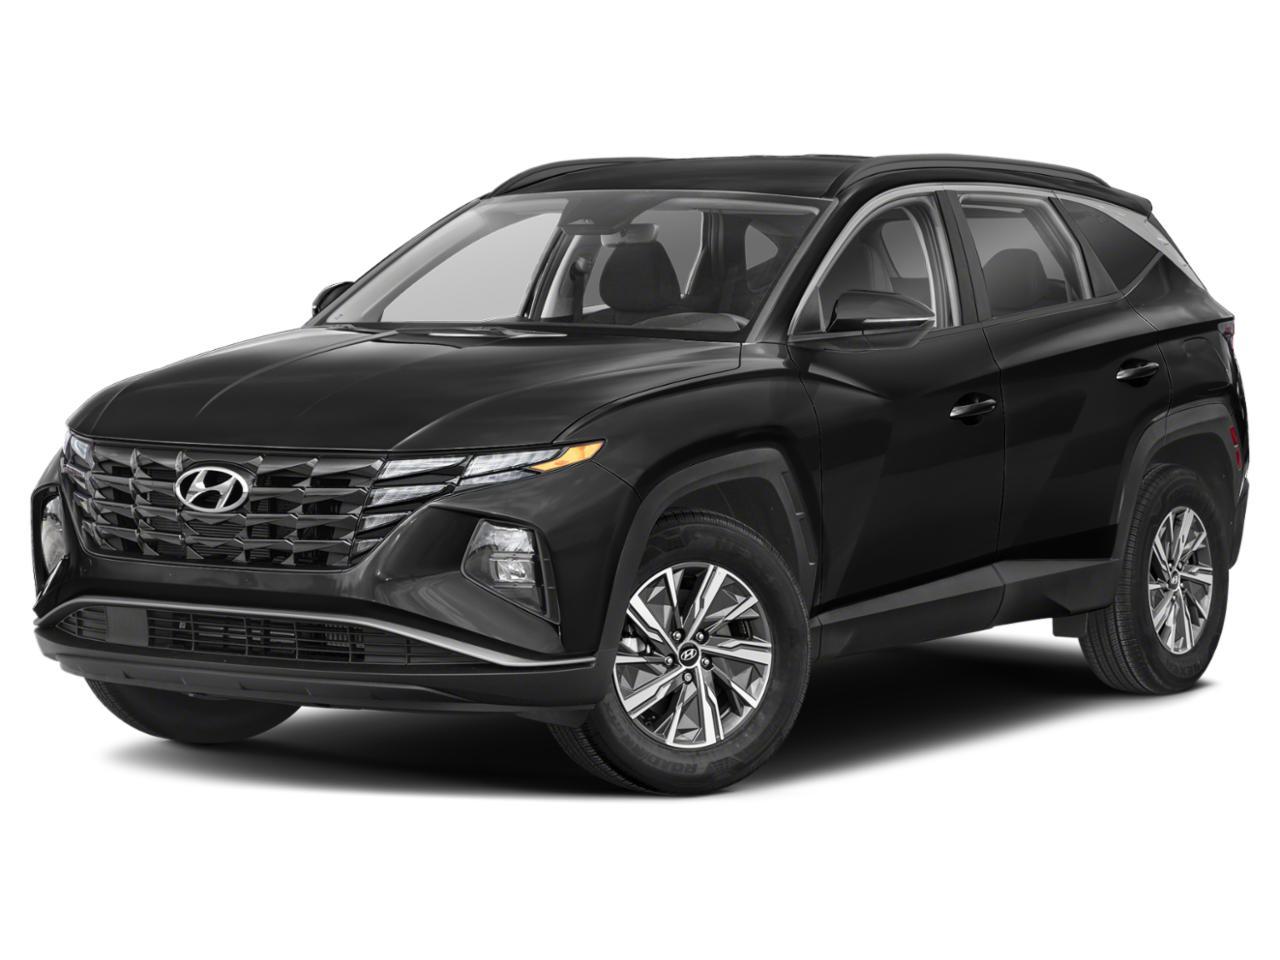 2022 Hyundai Tucson Hybrid Vehicle Photo in Peoria, IL 61615